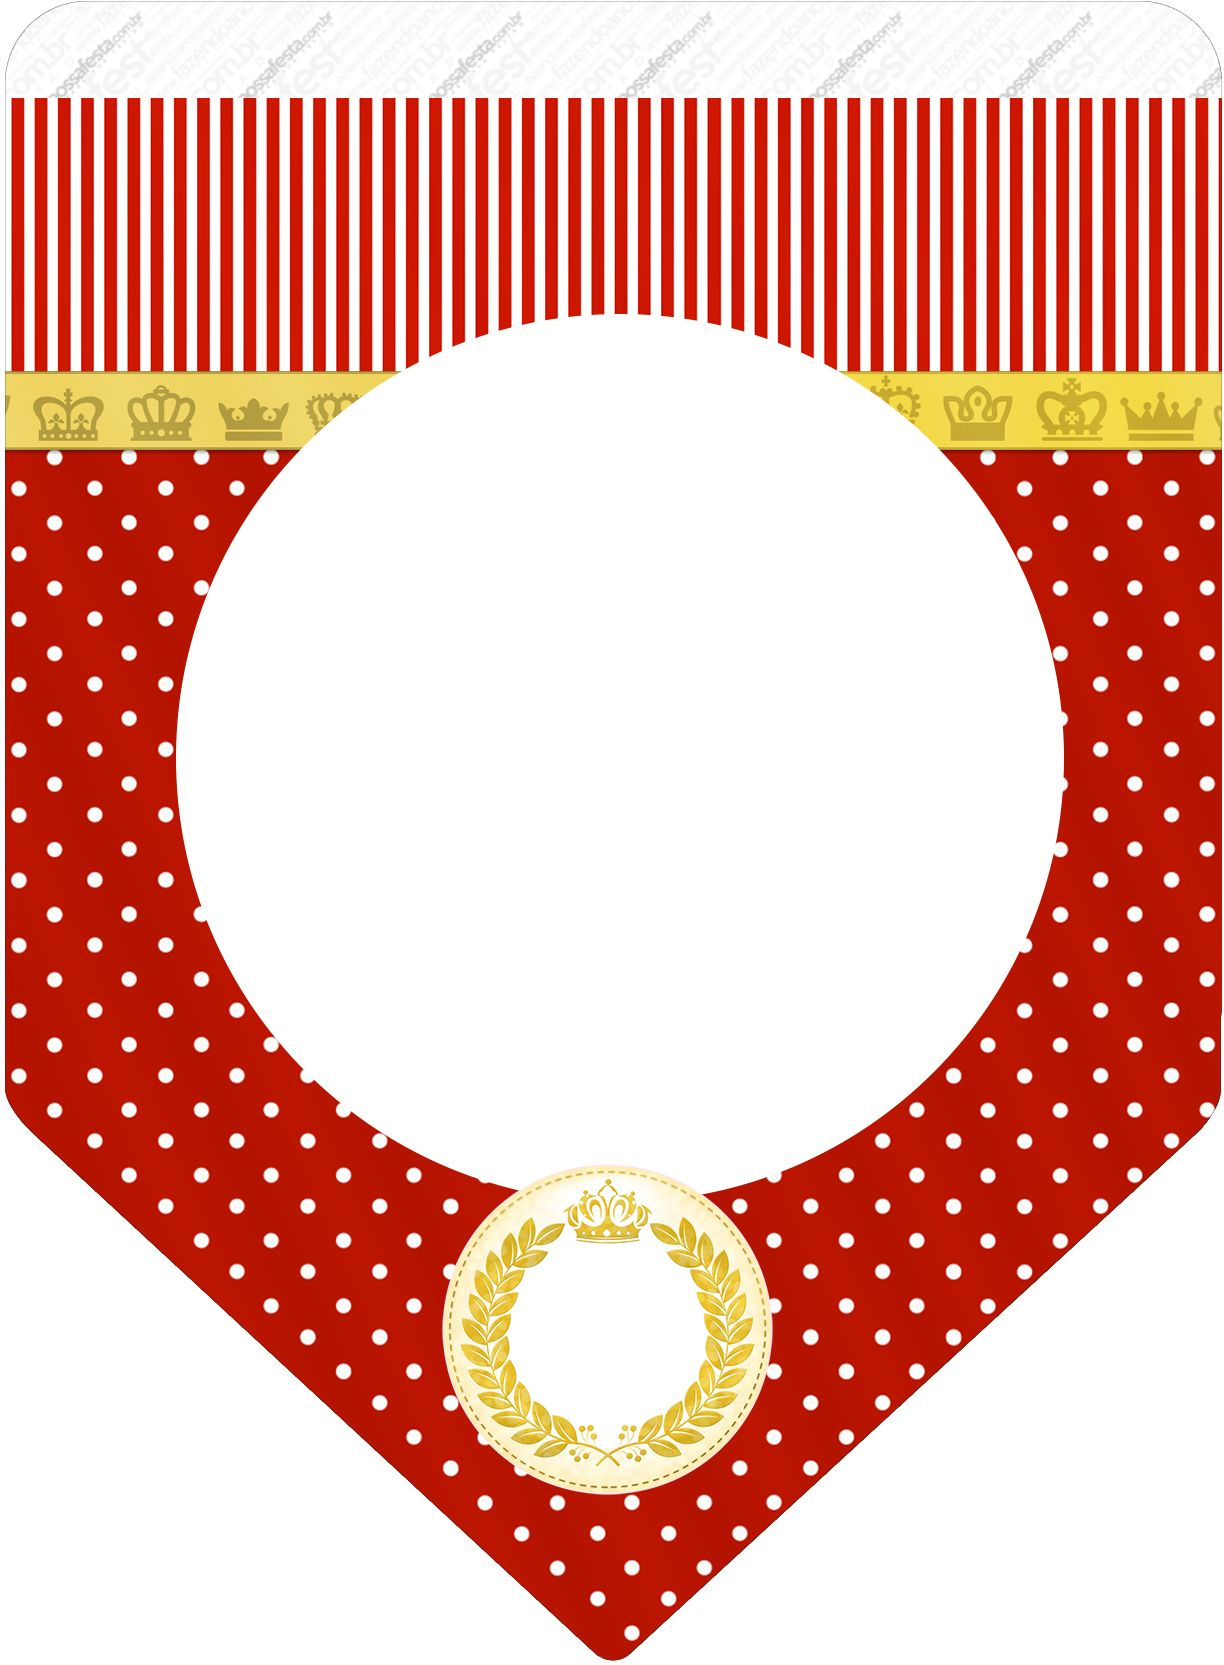 Bandeirinha Varalzinho Realeza Vermelho | Varais, Realeza ...